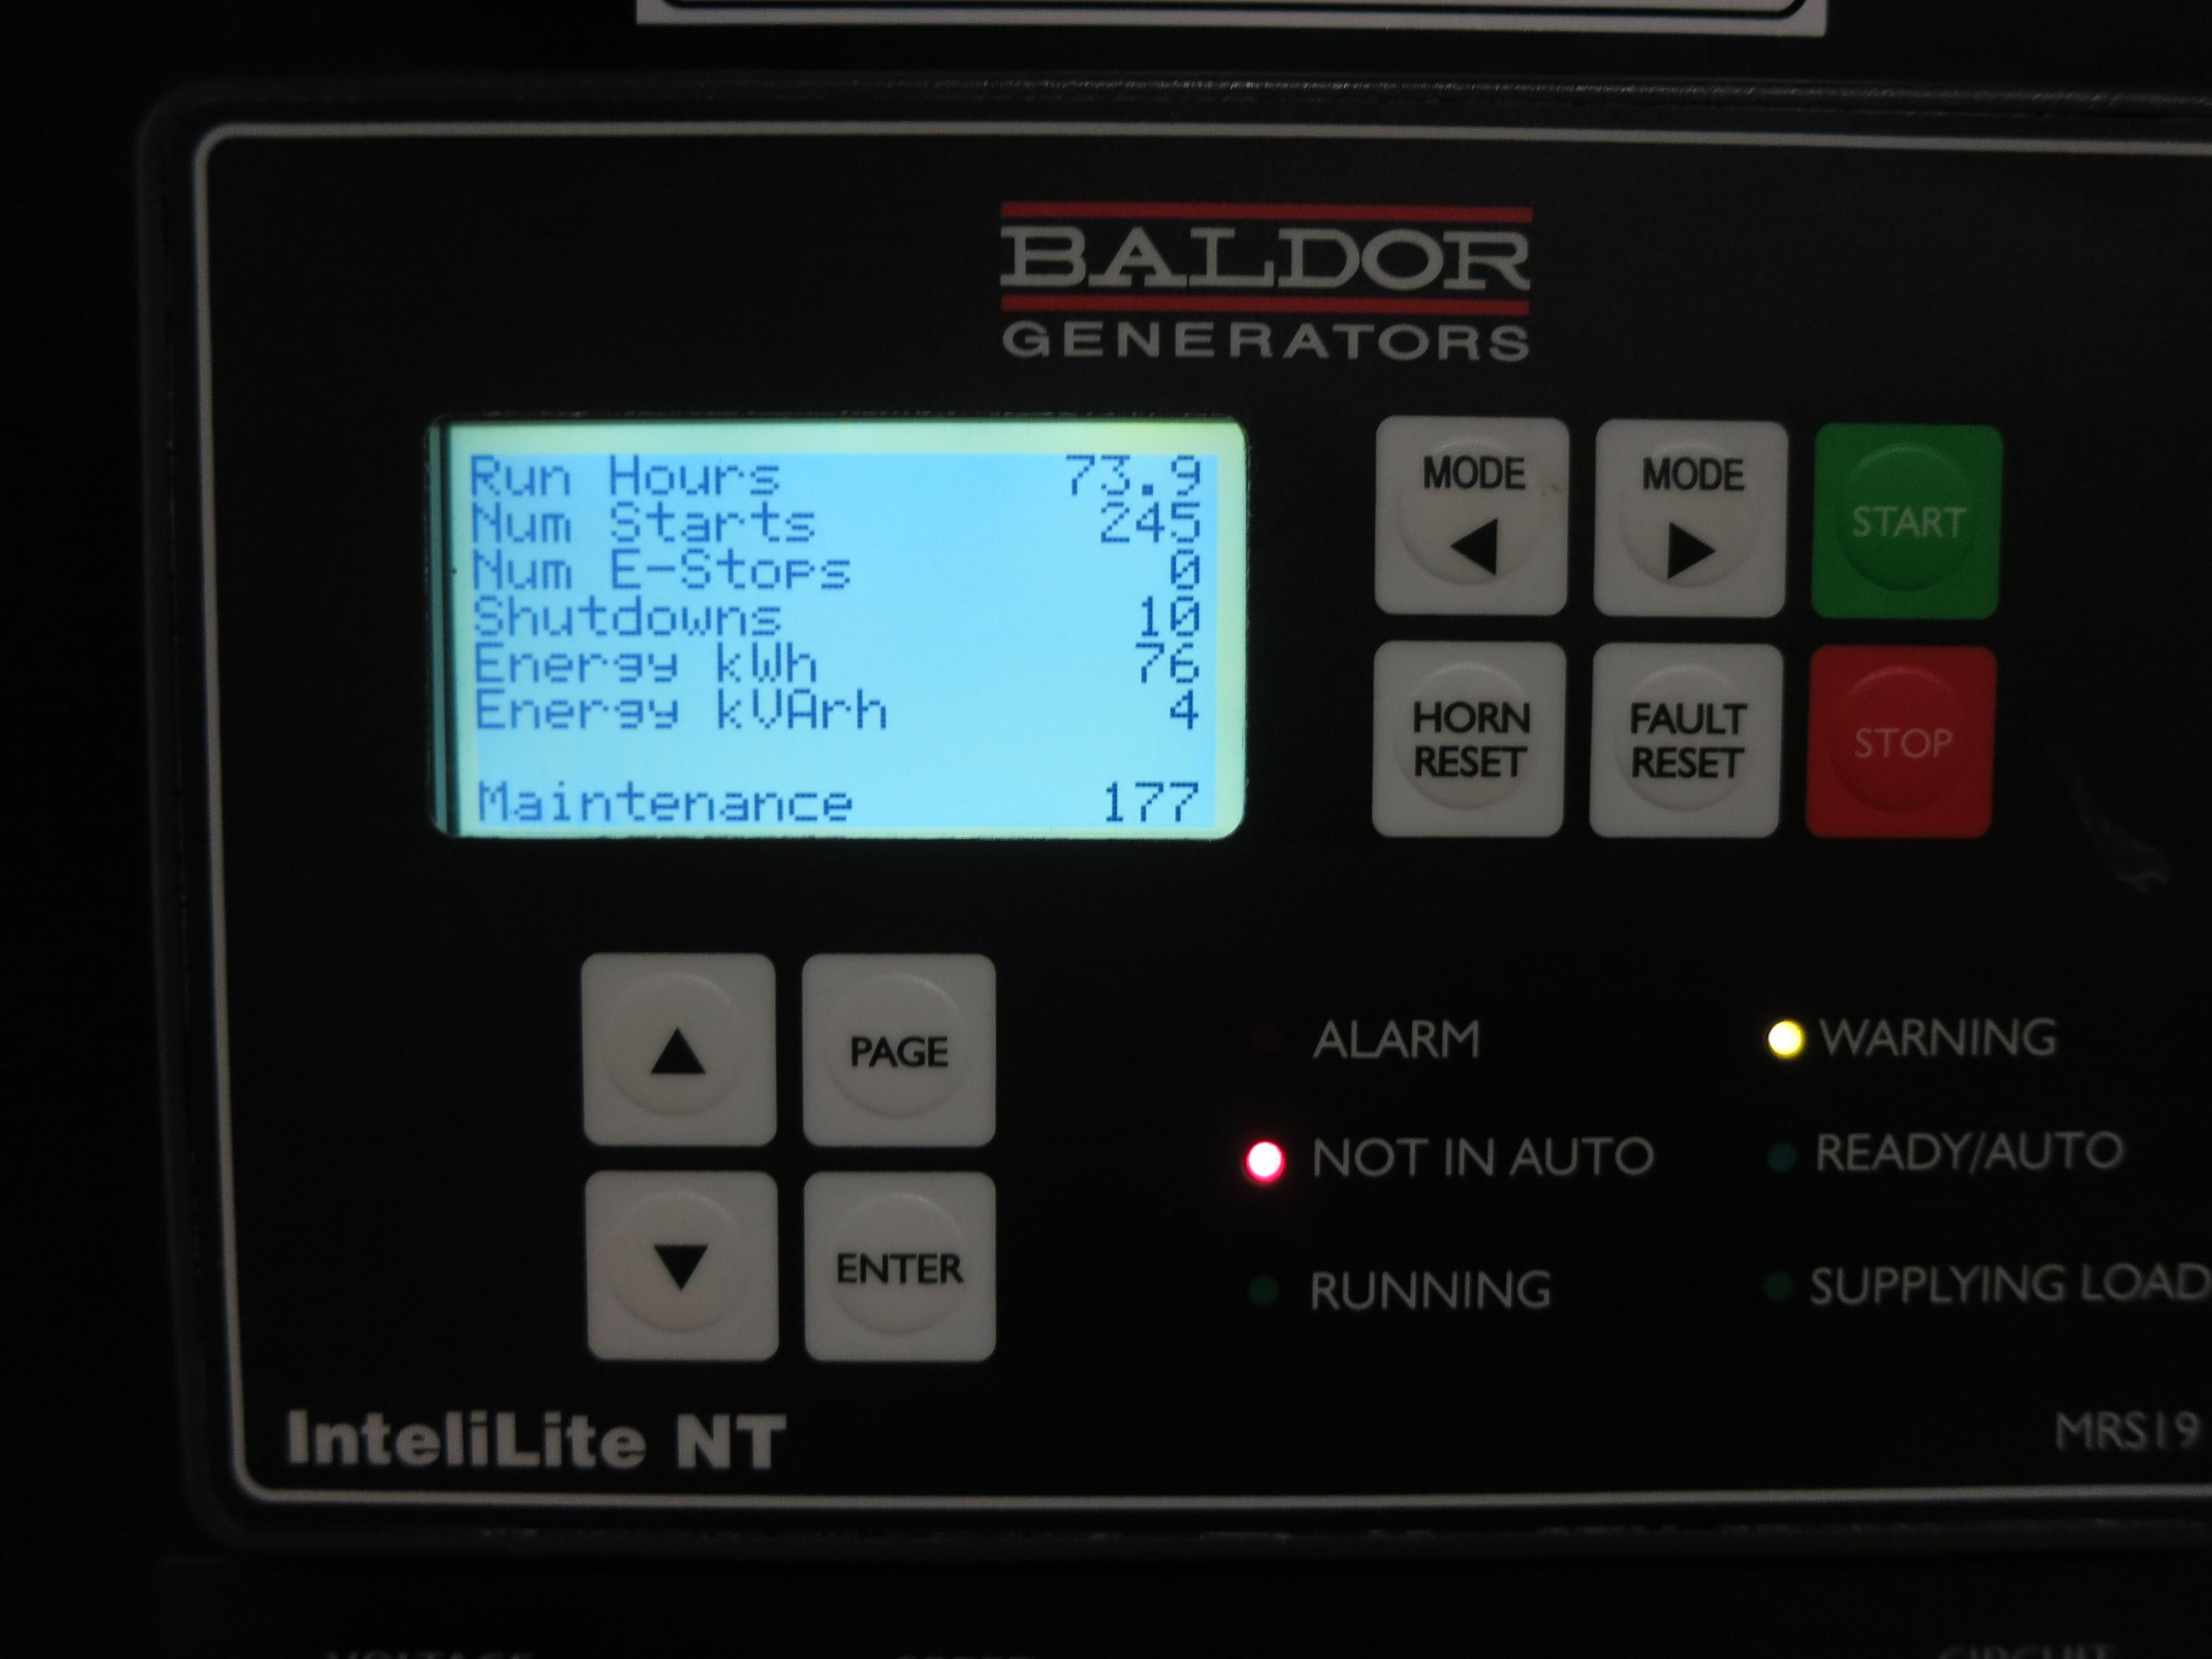 Used Baldor Iglc35 2gu Natural Gas Generator 74 Hrs 30 Kw 0 Motor Maintenance Manual Price Csdg